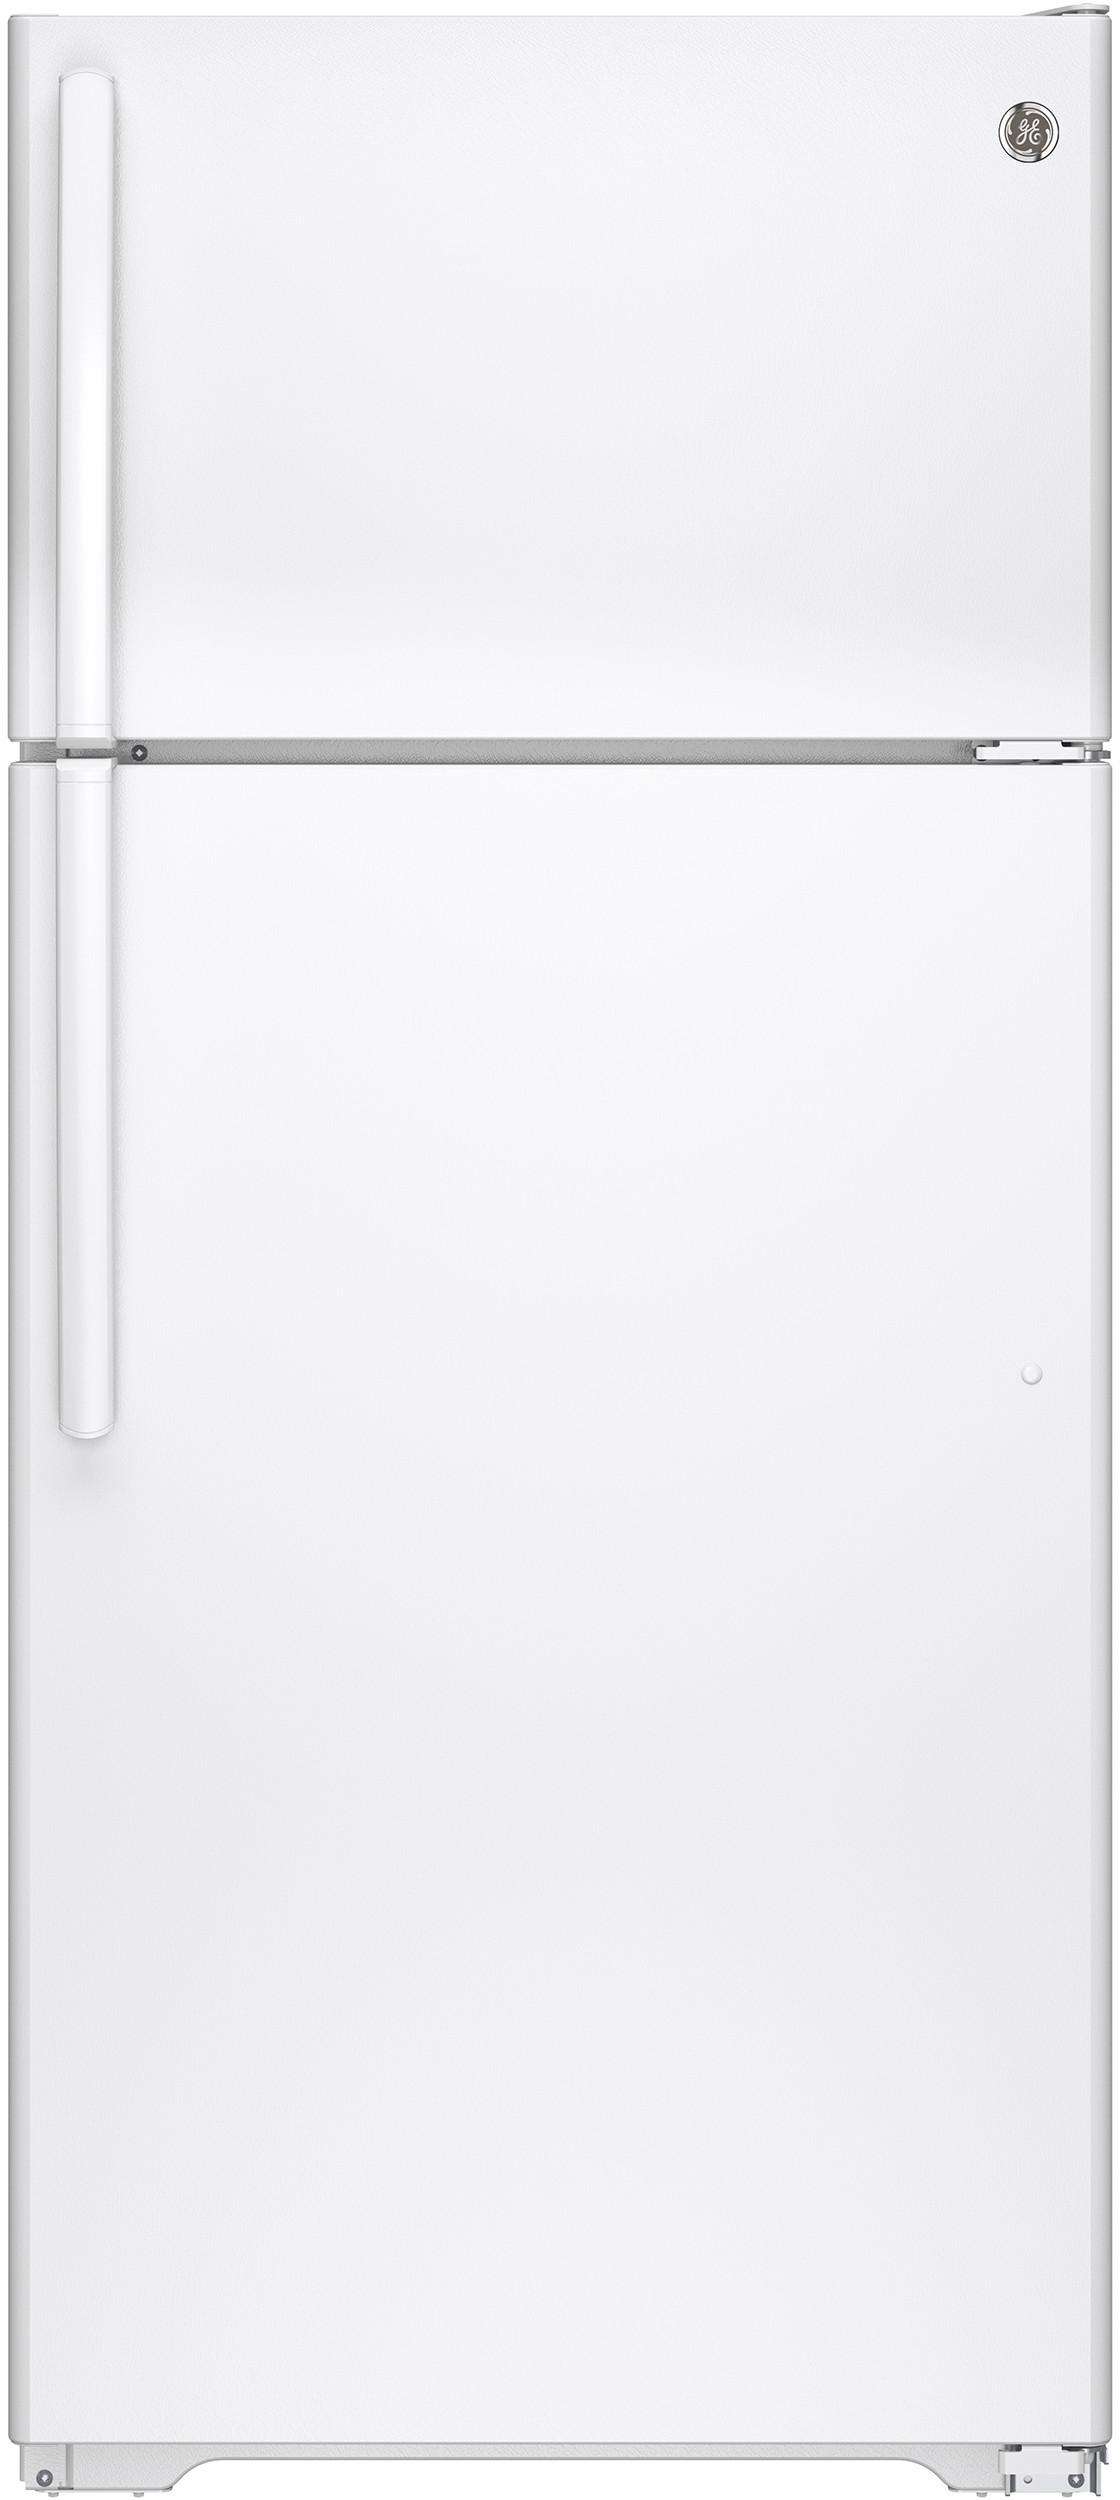 GE GTS16DTHWW 28 Inch Top-Freezer Refrigerator with